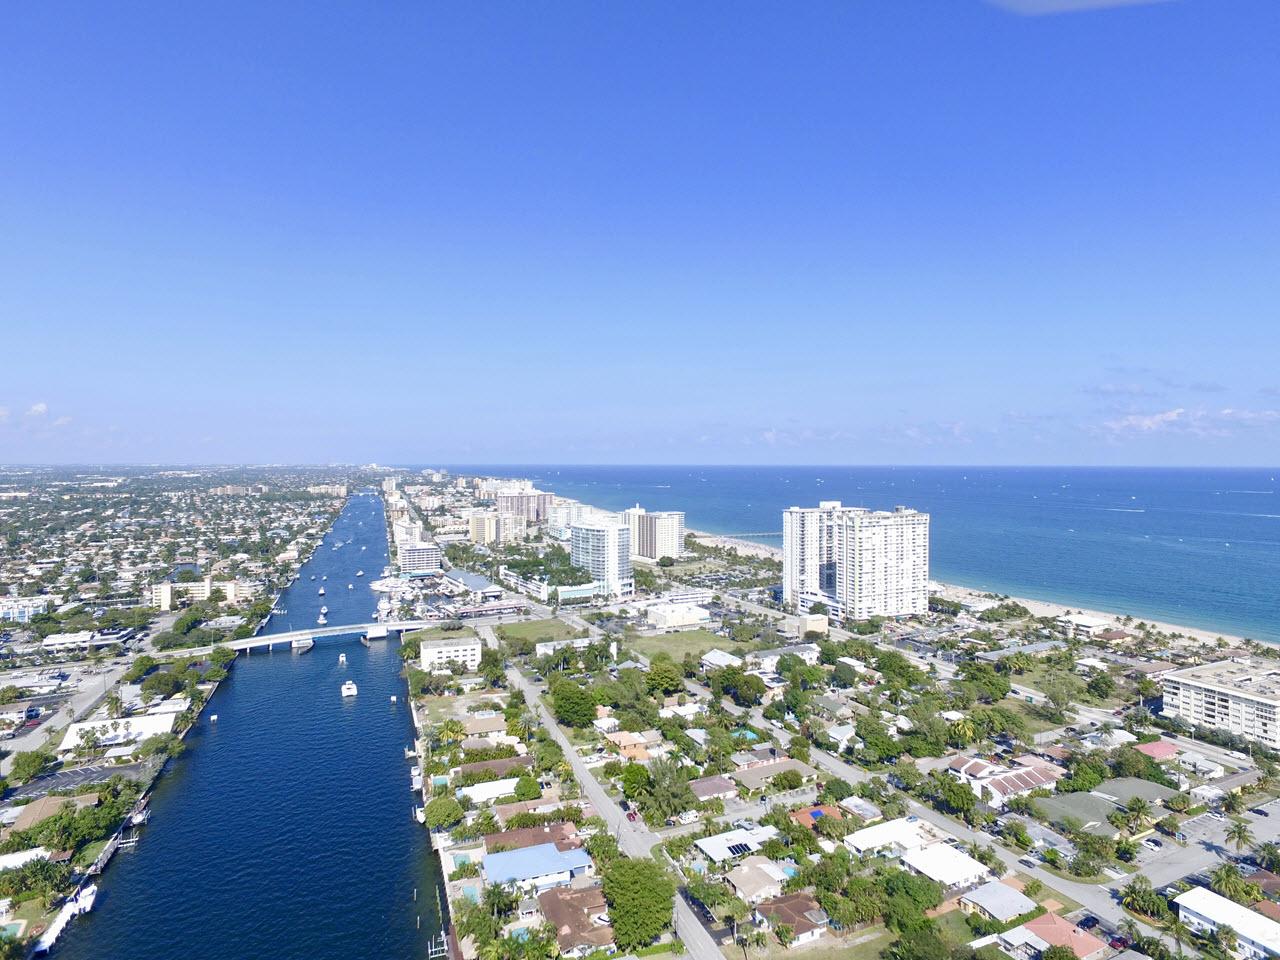 Pure Residence Pombano Beach by Paul Connolly Invest Miami Pombano Beach 006